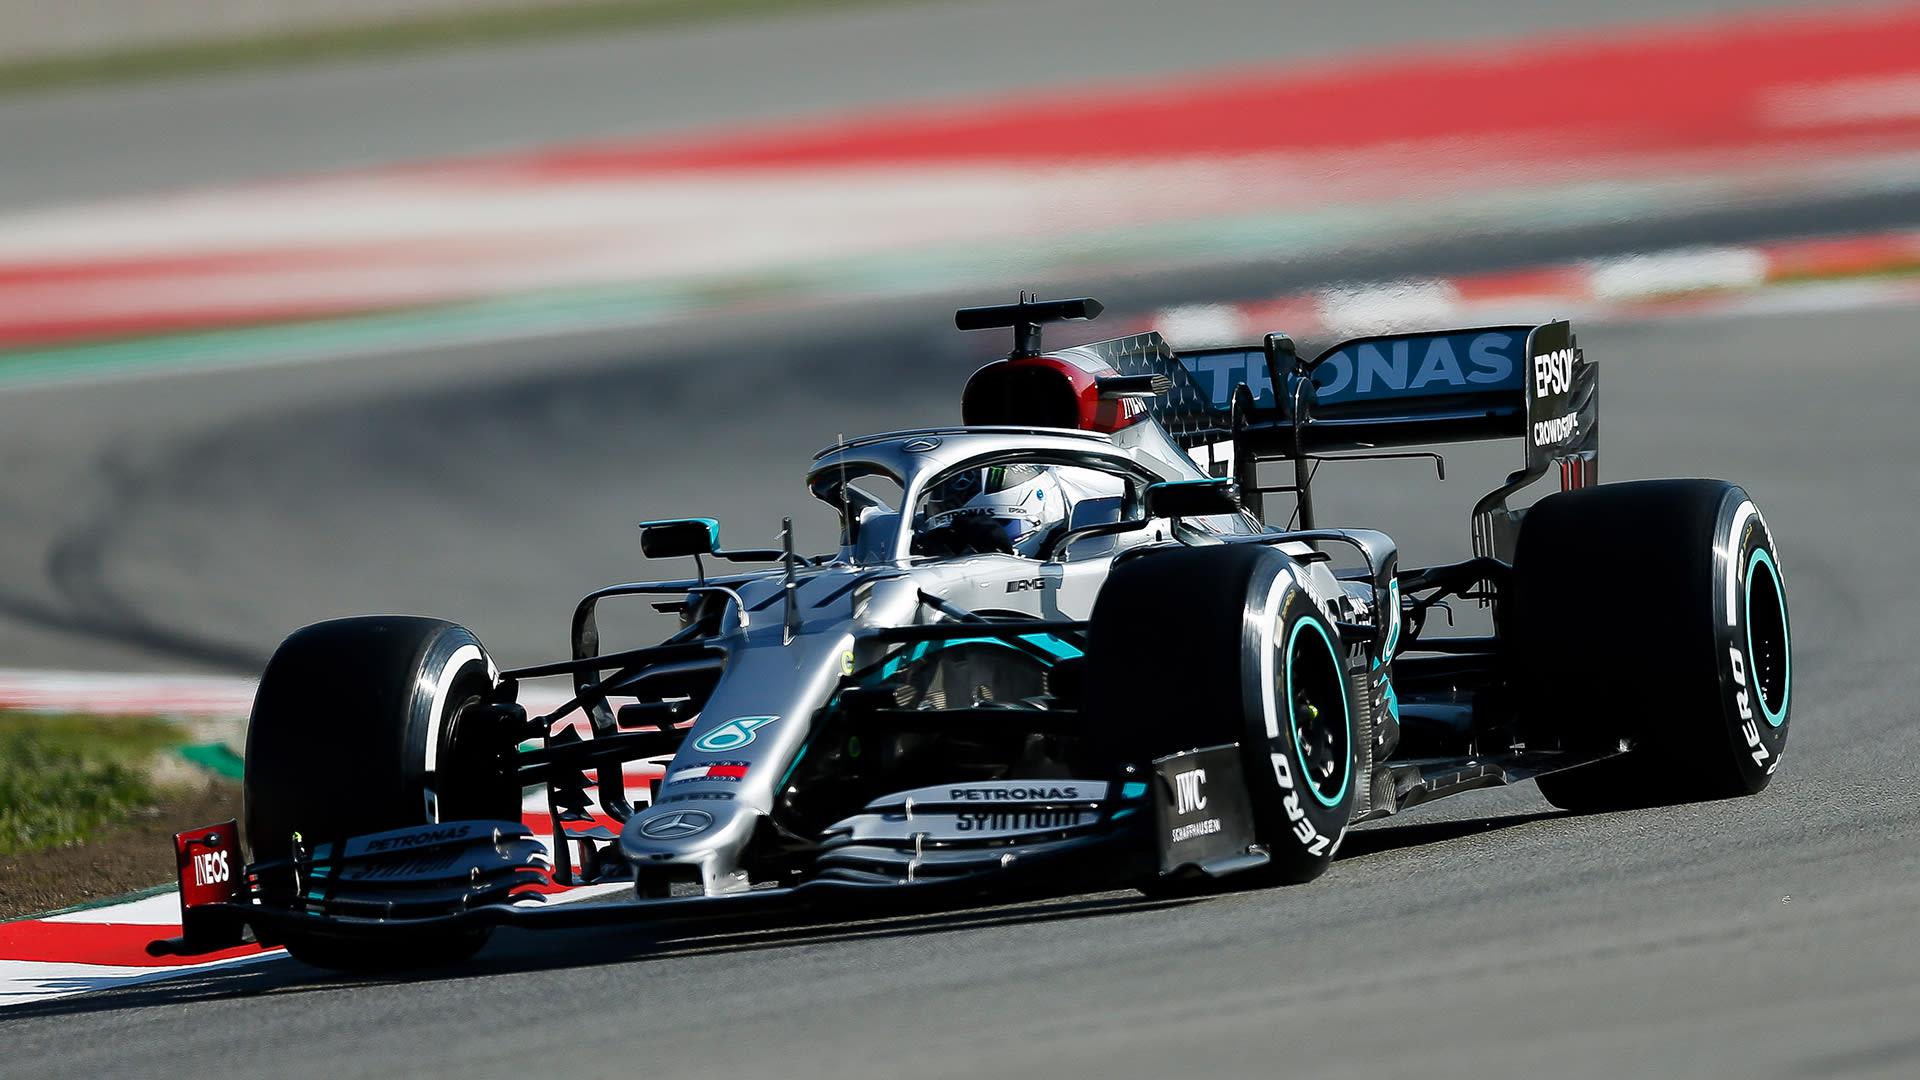 F1 pre-season testing day 1: Valtteri Bottas fastest on opening morning ahead of Sergio Perez and Max Verstappen   Formula 1®